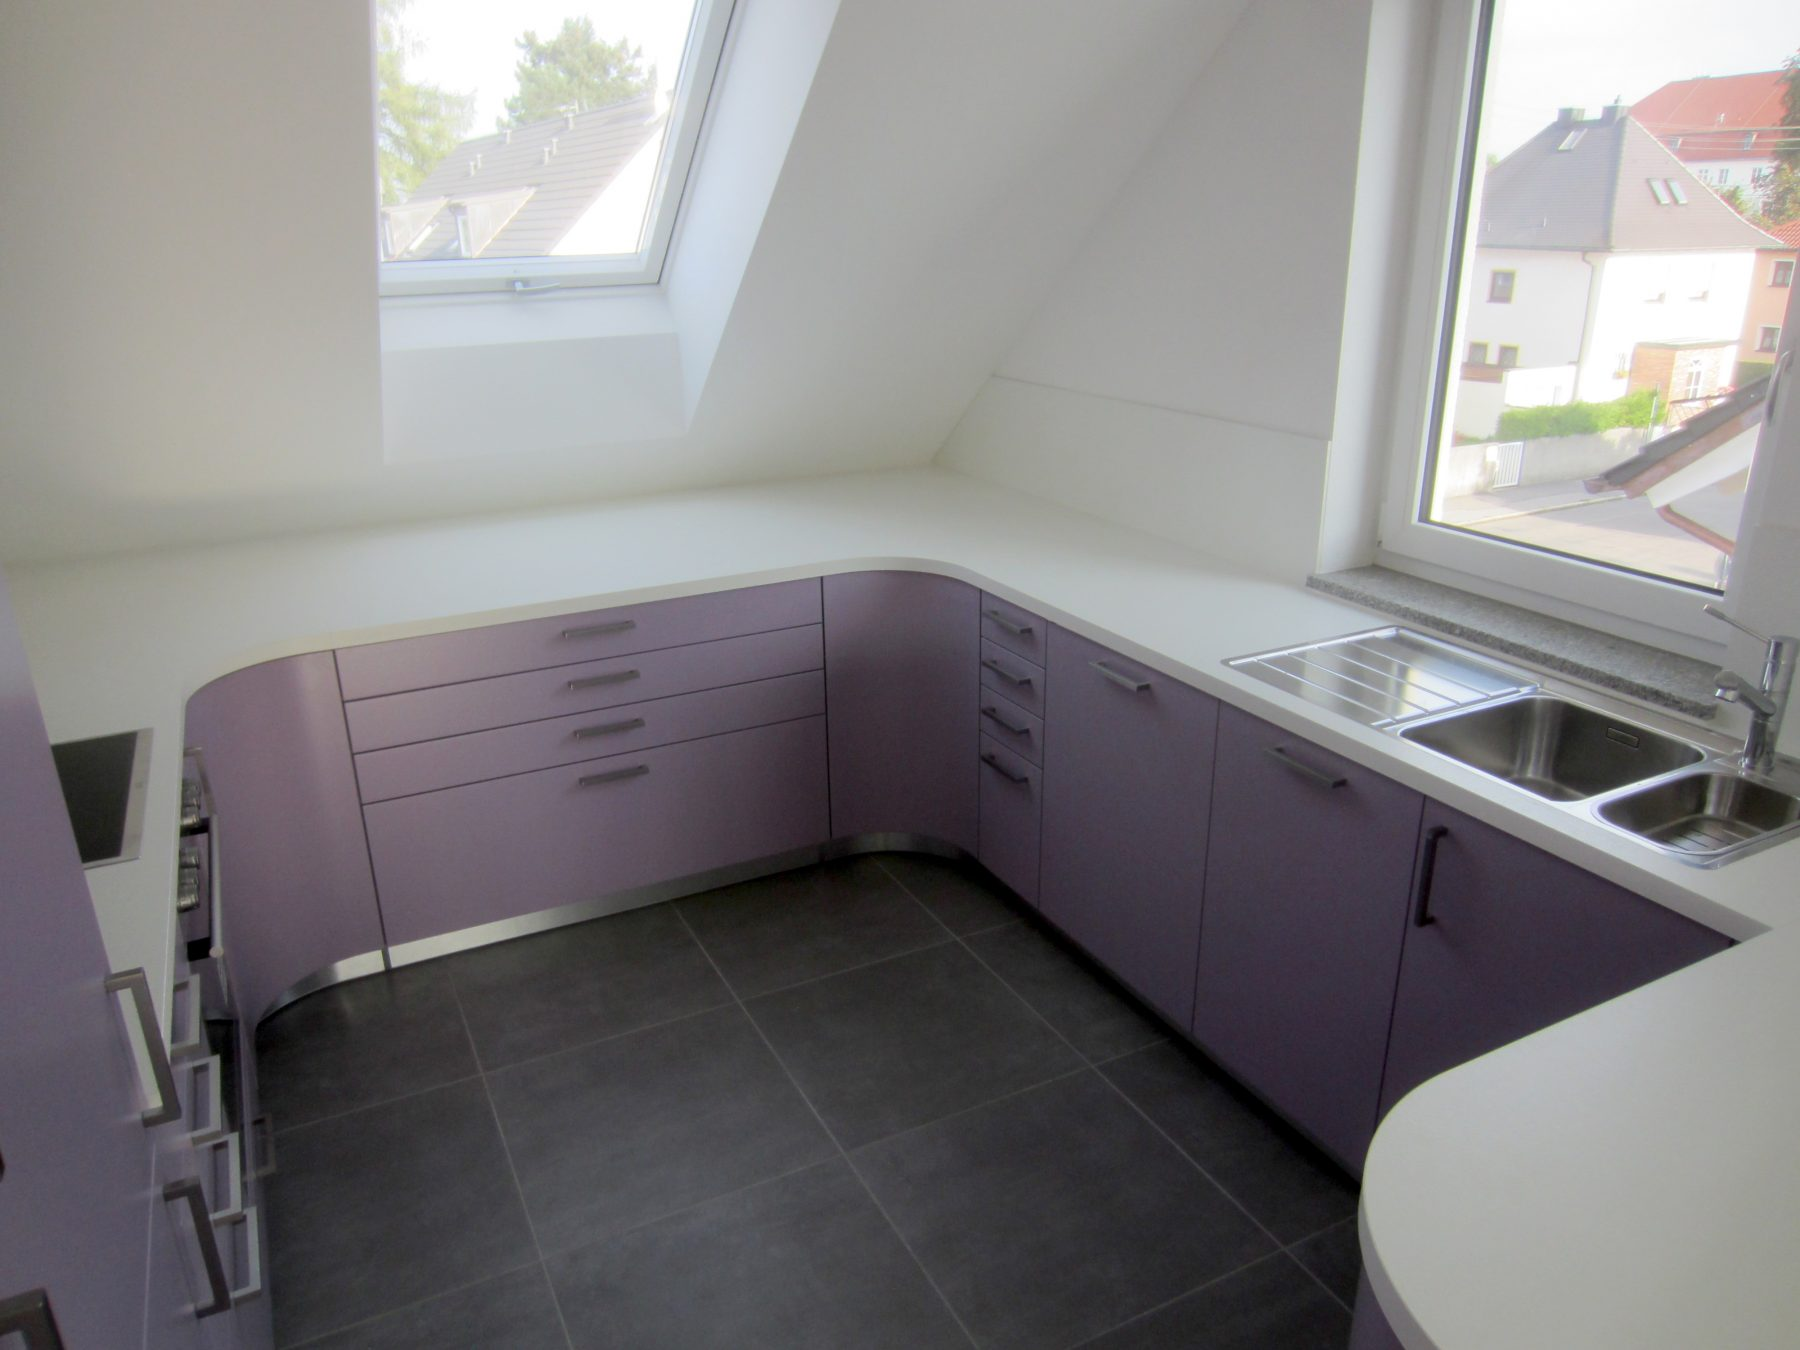 Outdoorküche Arbeitsplatte Verleih : Outdoorküche arbeitsplatte verleih: hagebau arbeitsplatten küche